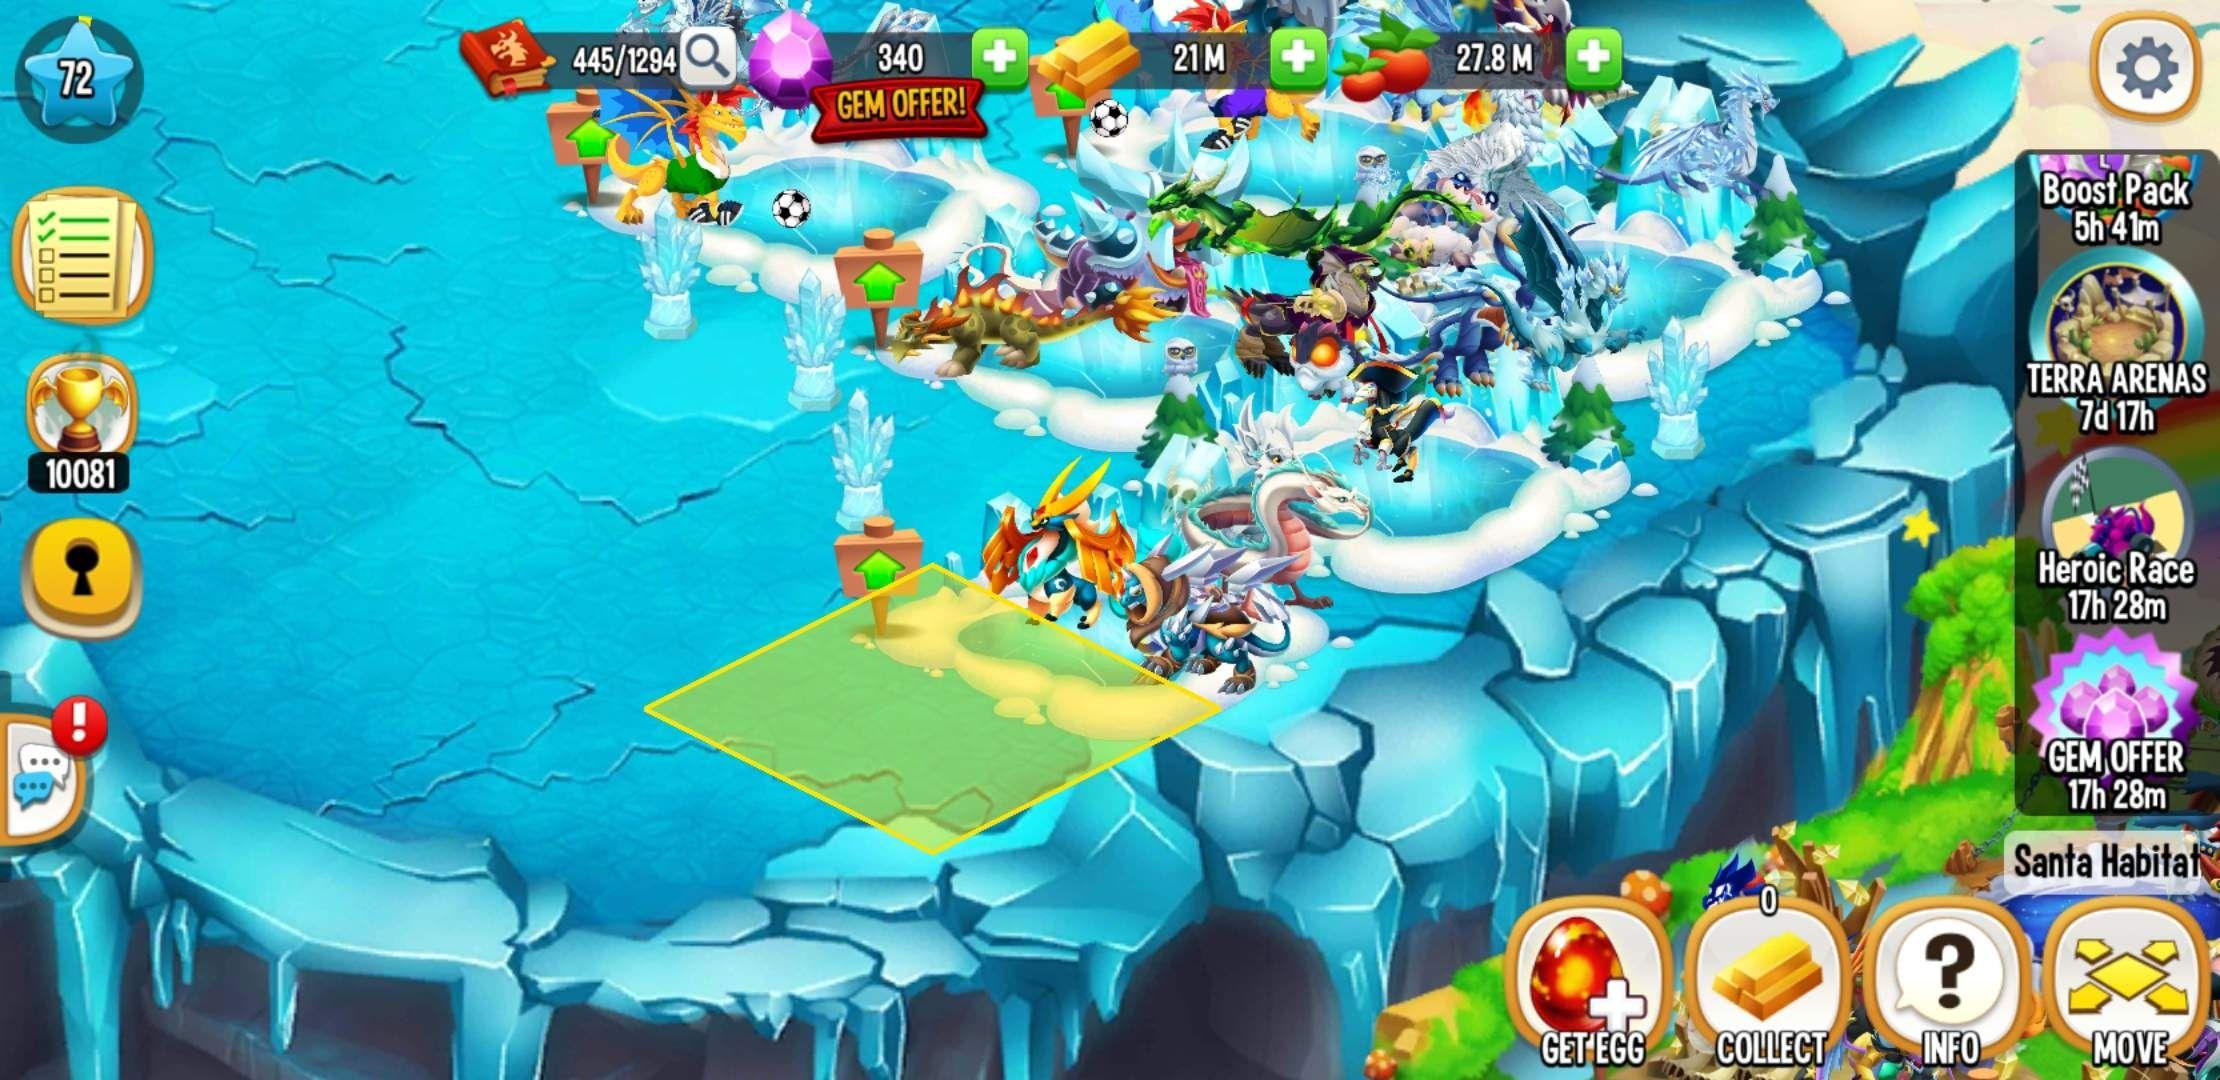 0_1587314189761_DragonCity_2020-04-20-00-31-43.jpg